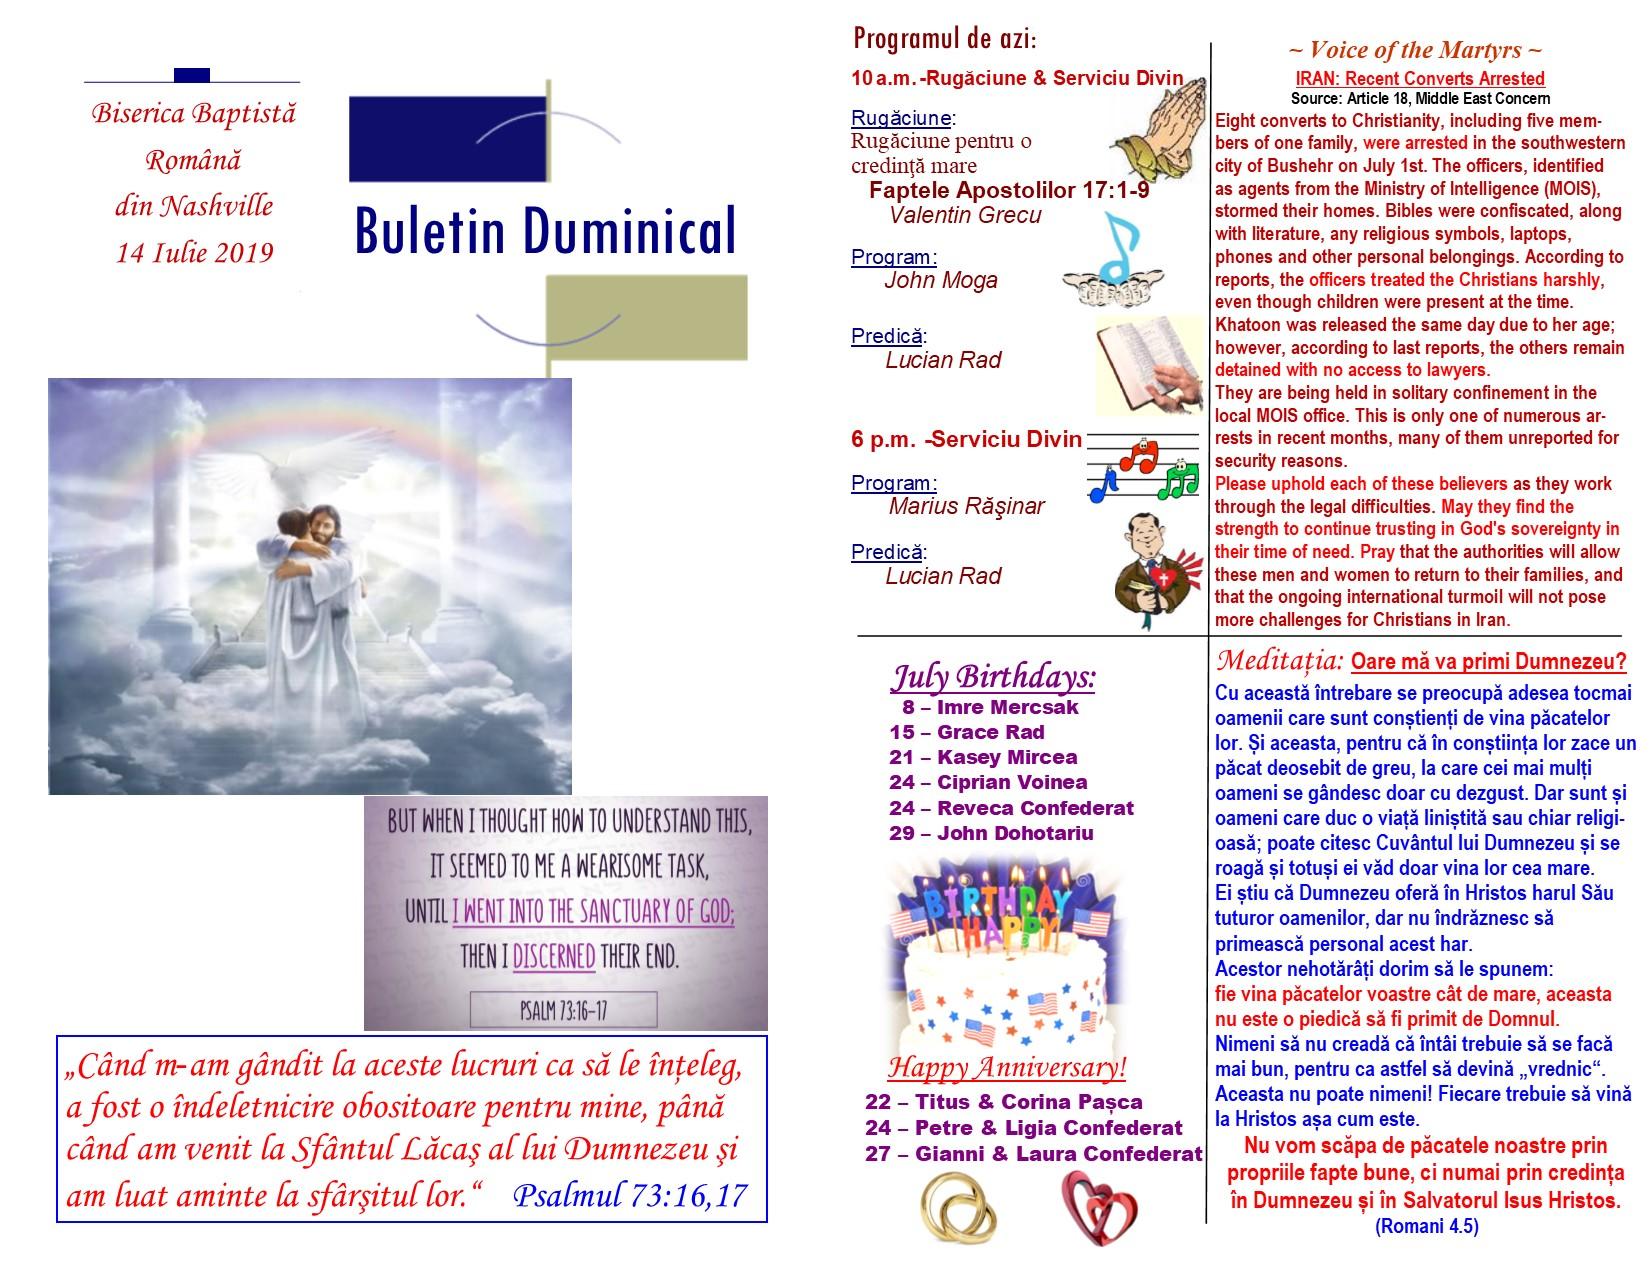 Buletin 07-14-19 page 1 & 2